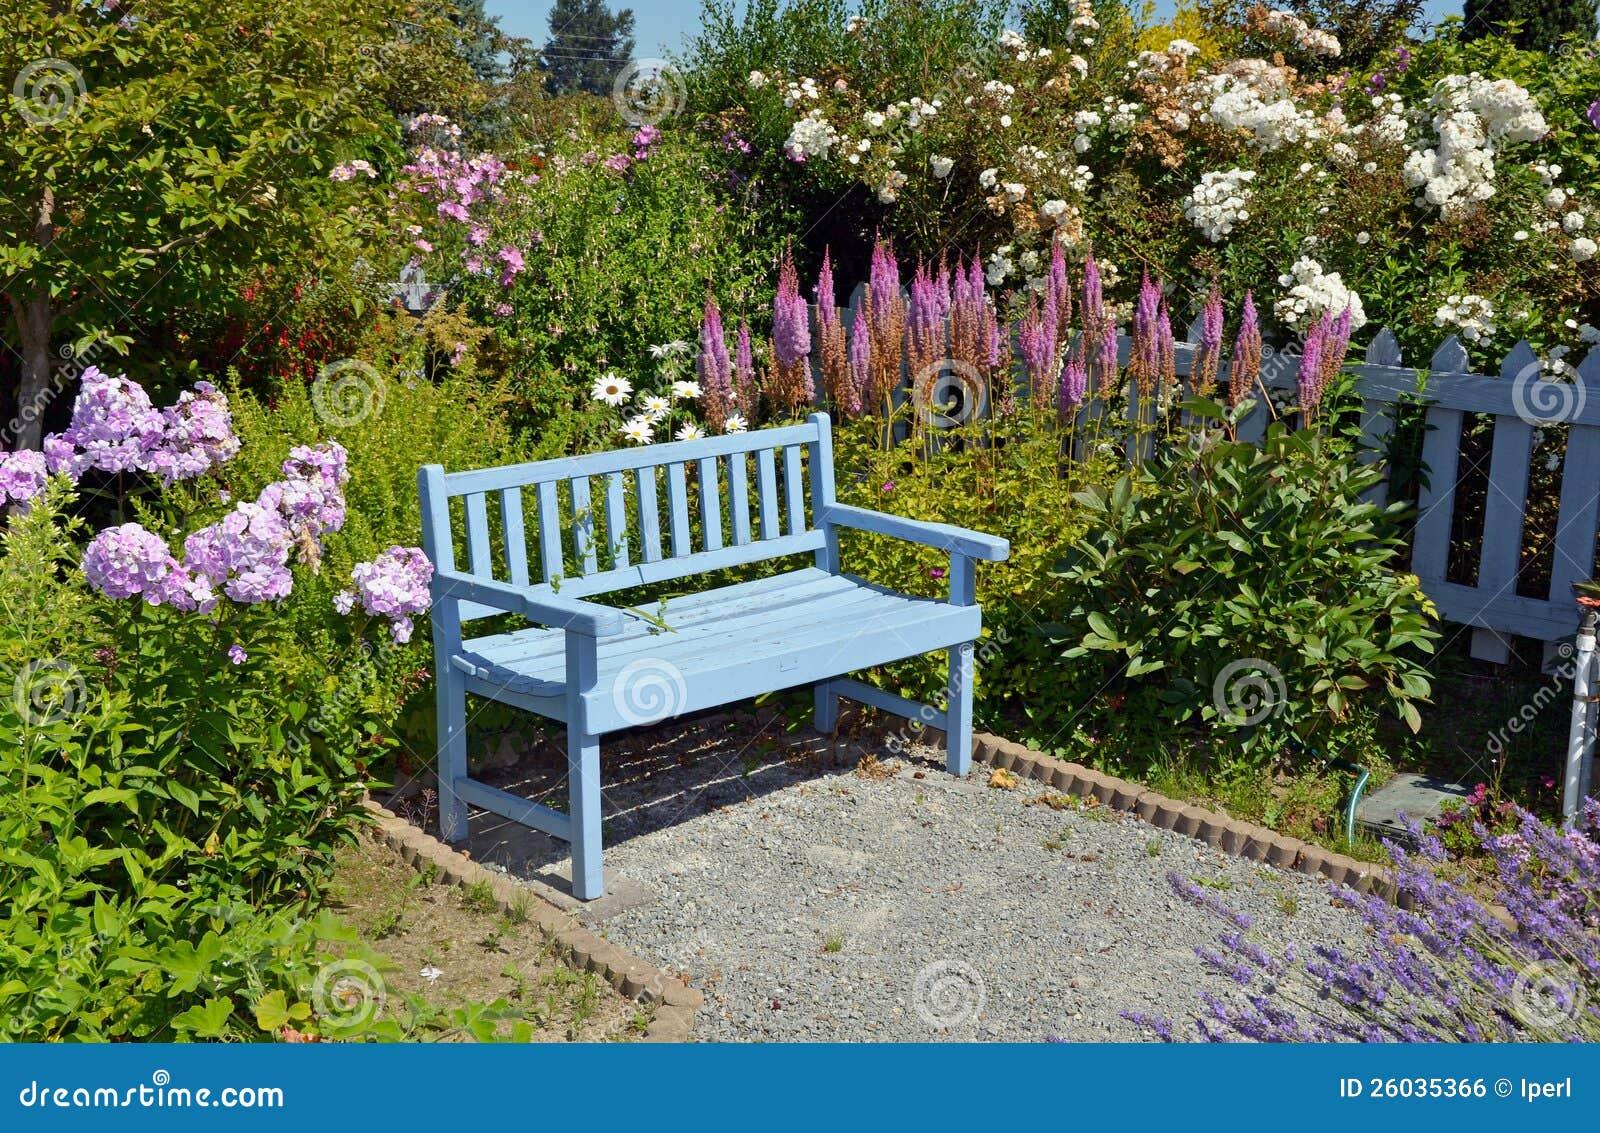 Blaue gartenbank stockfoto bild von bunt sitz blumen - Gartenbank bunt ...